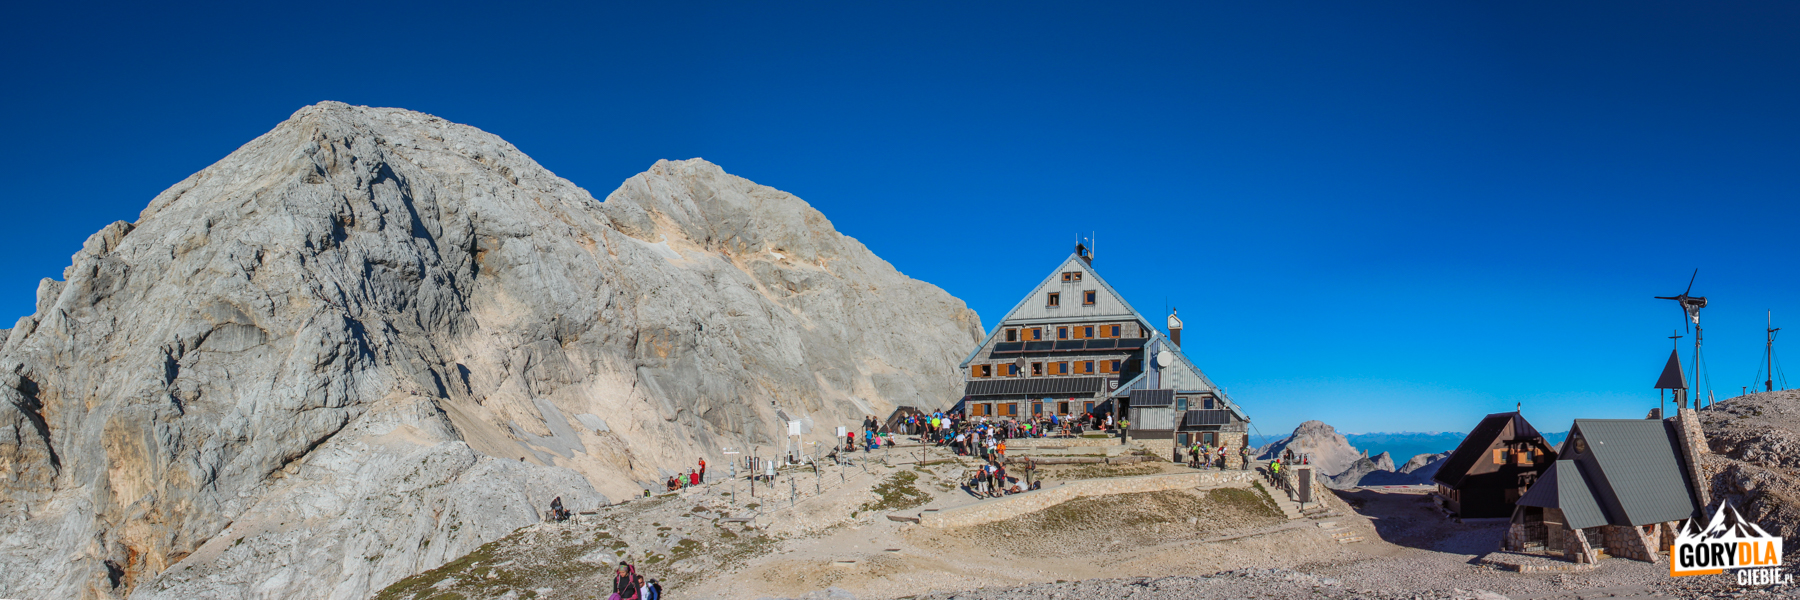 "Schronisko ""Triglavski dom na Kredarici"" (2515 m), w tle Triglav"